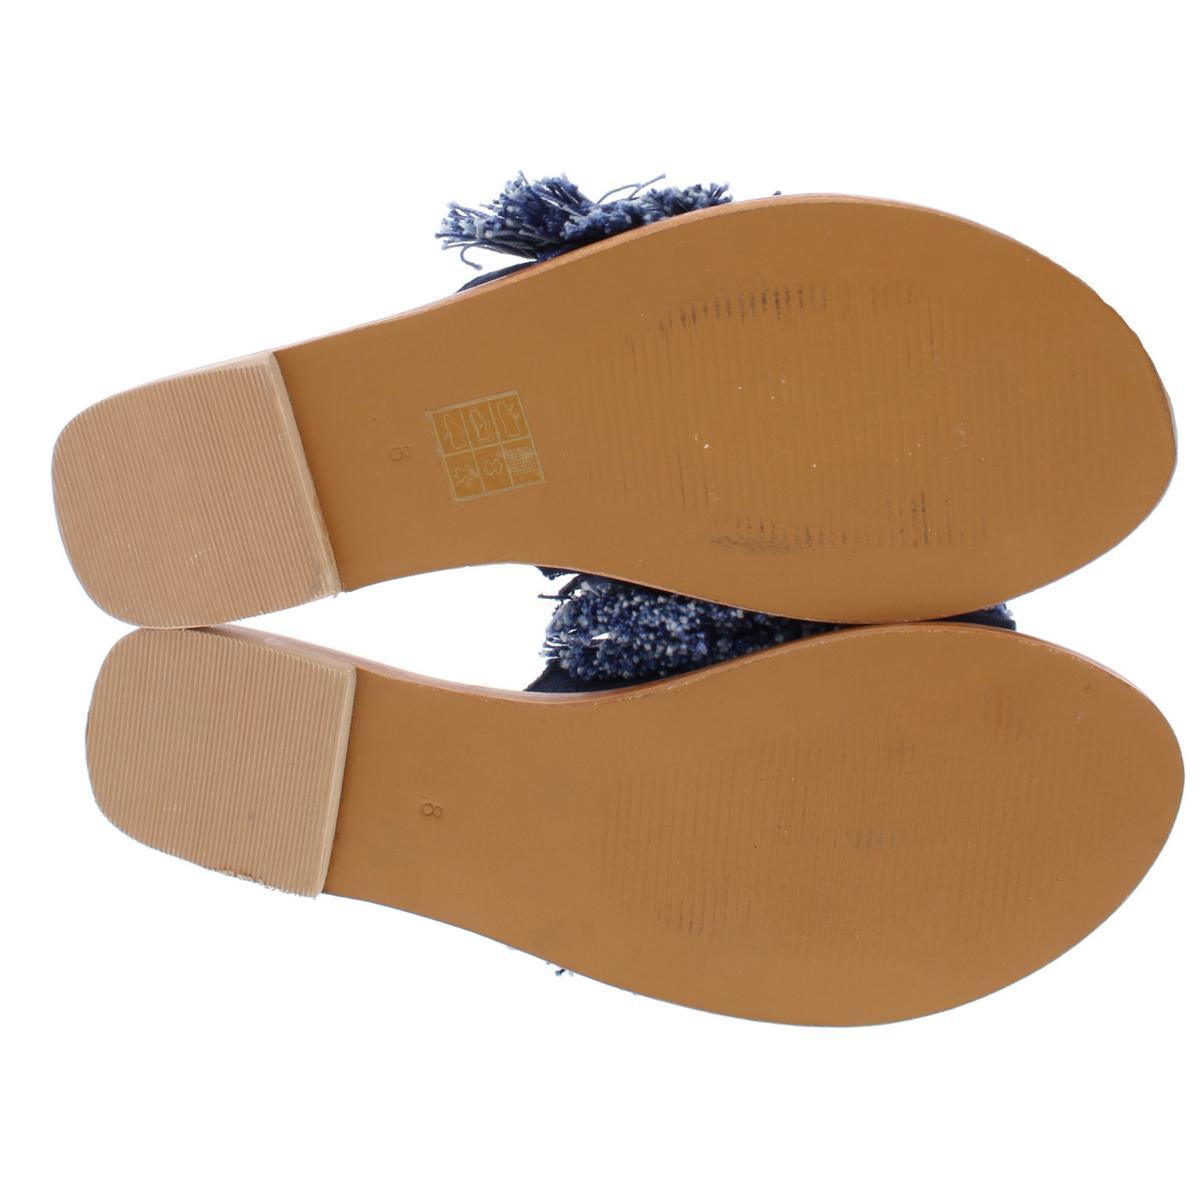 L-039-ideologie-Femme-Gabii-Daim-Trainer-Athletic-Fashion-Baskets-Chaussures-BHFO-5011 miniature 5